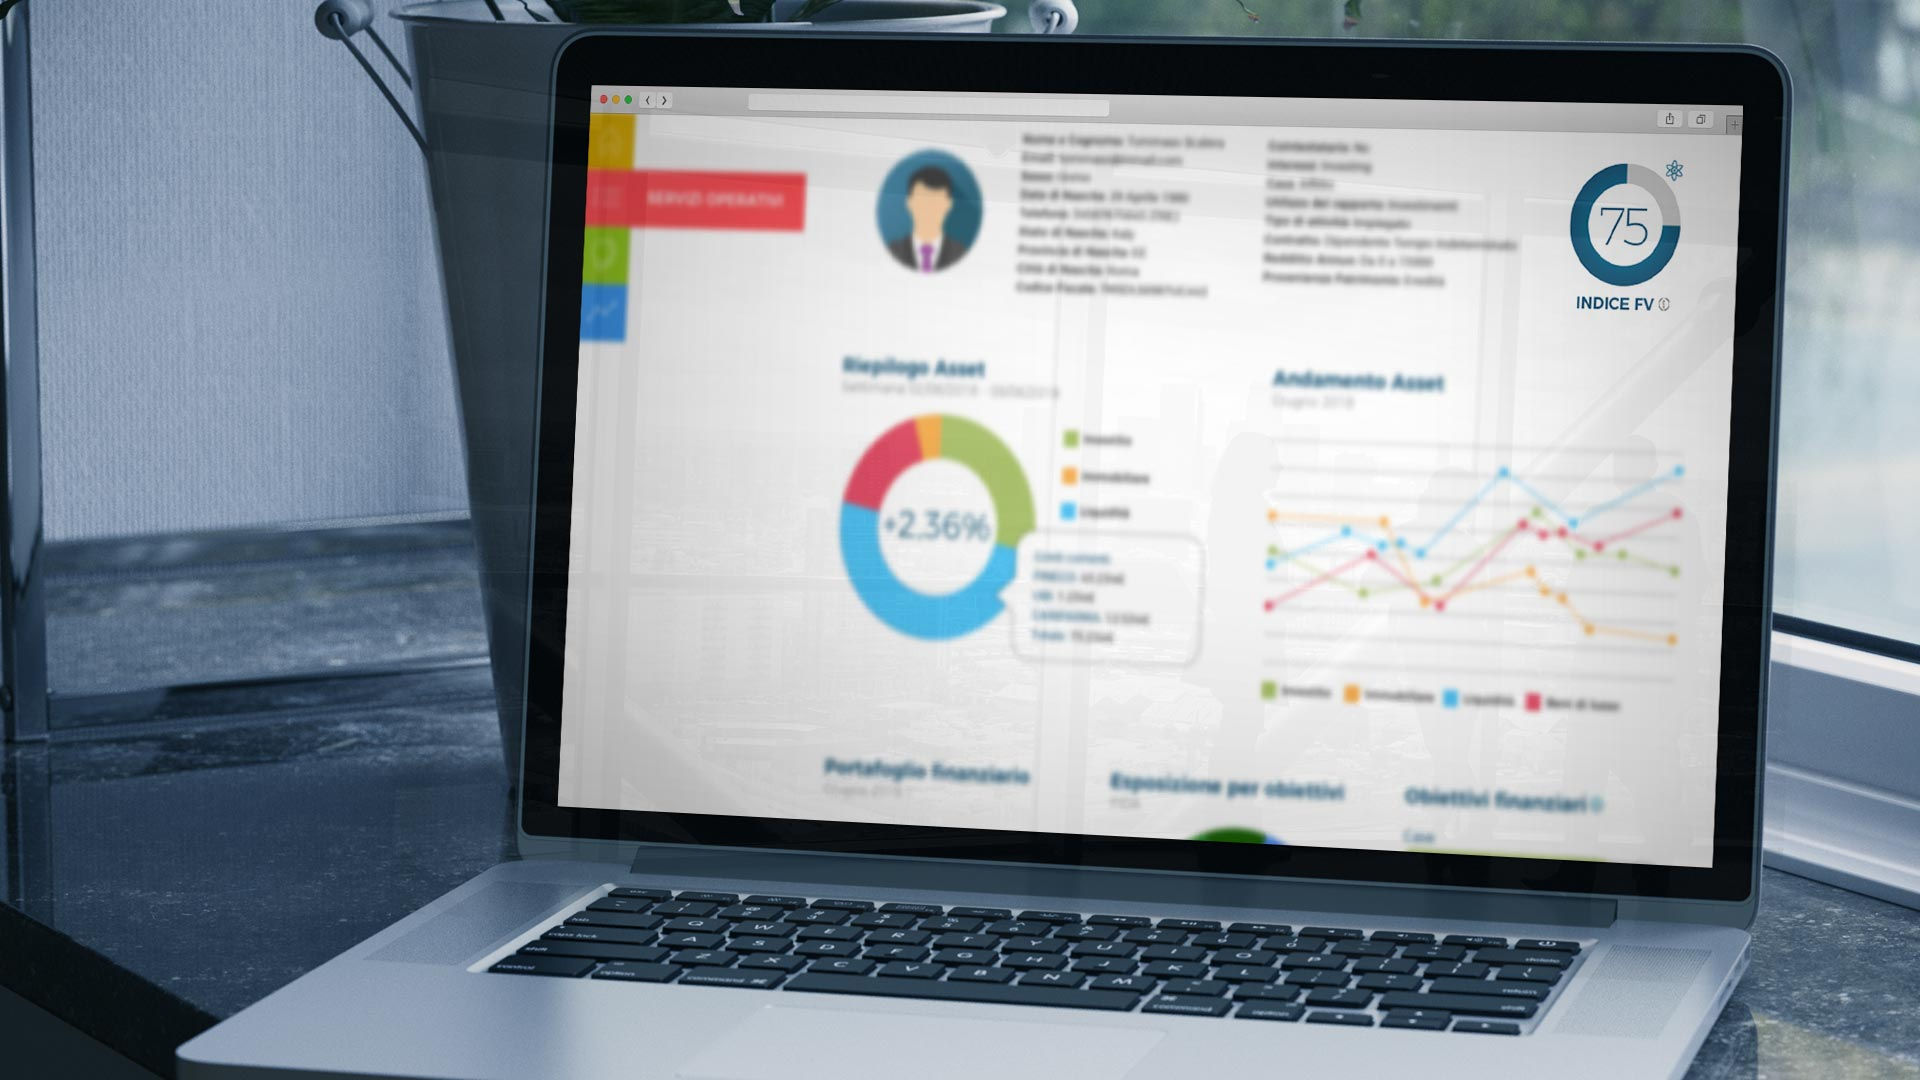 Piattaforma Fairvalyou e indice di salute cliente